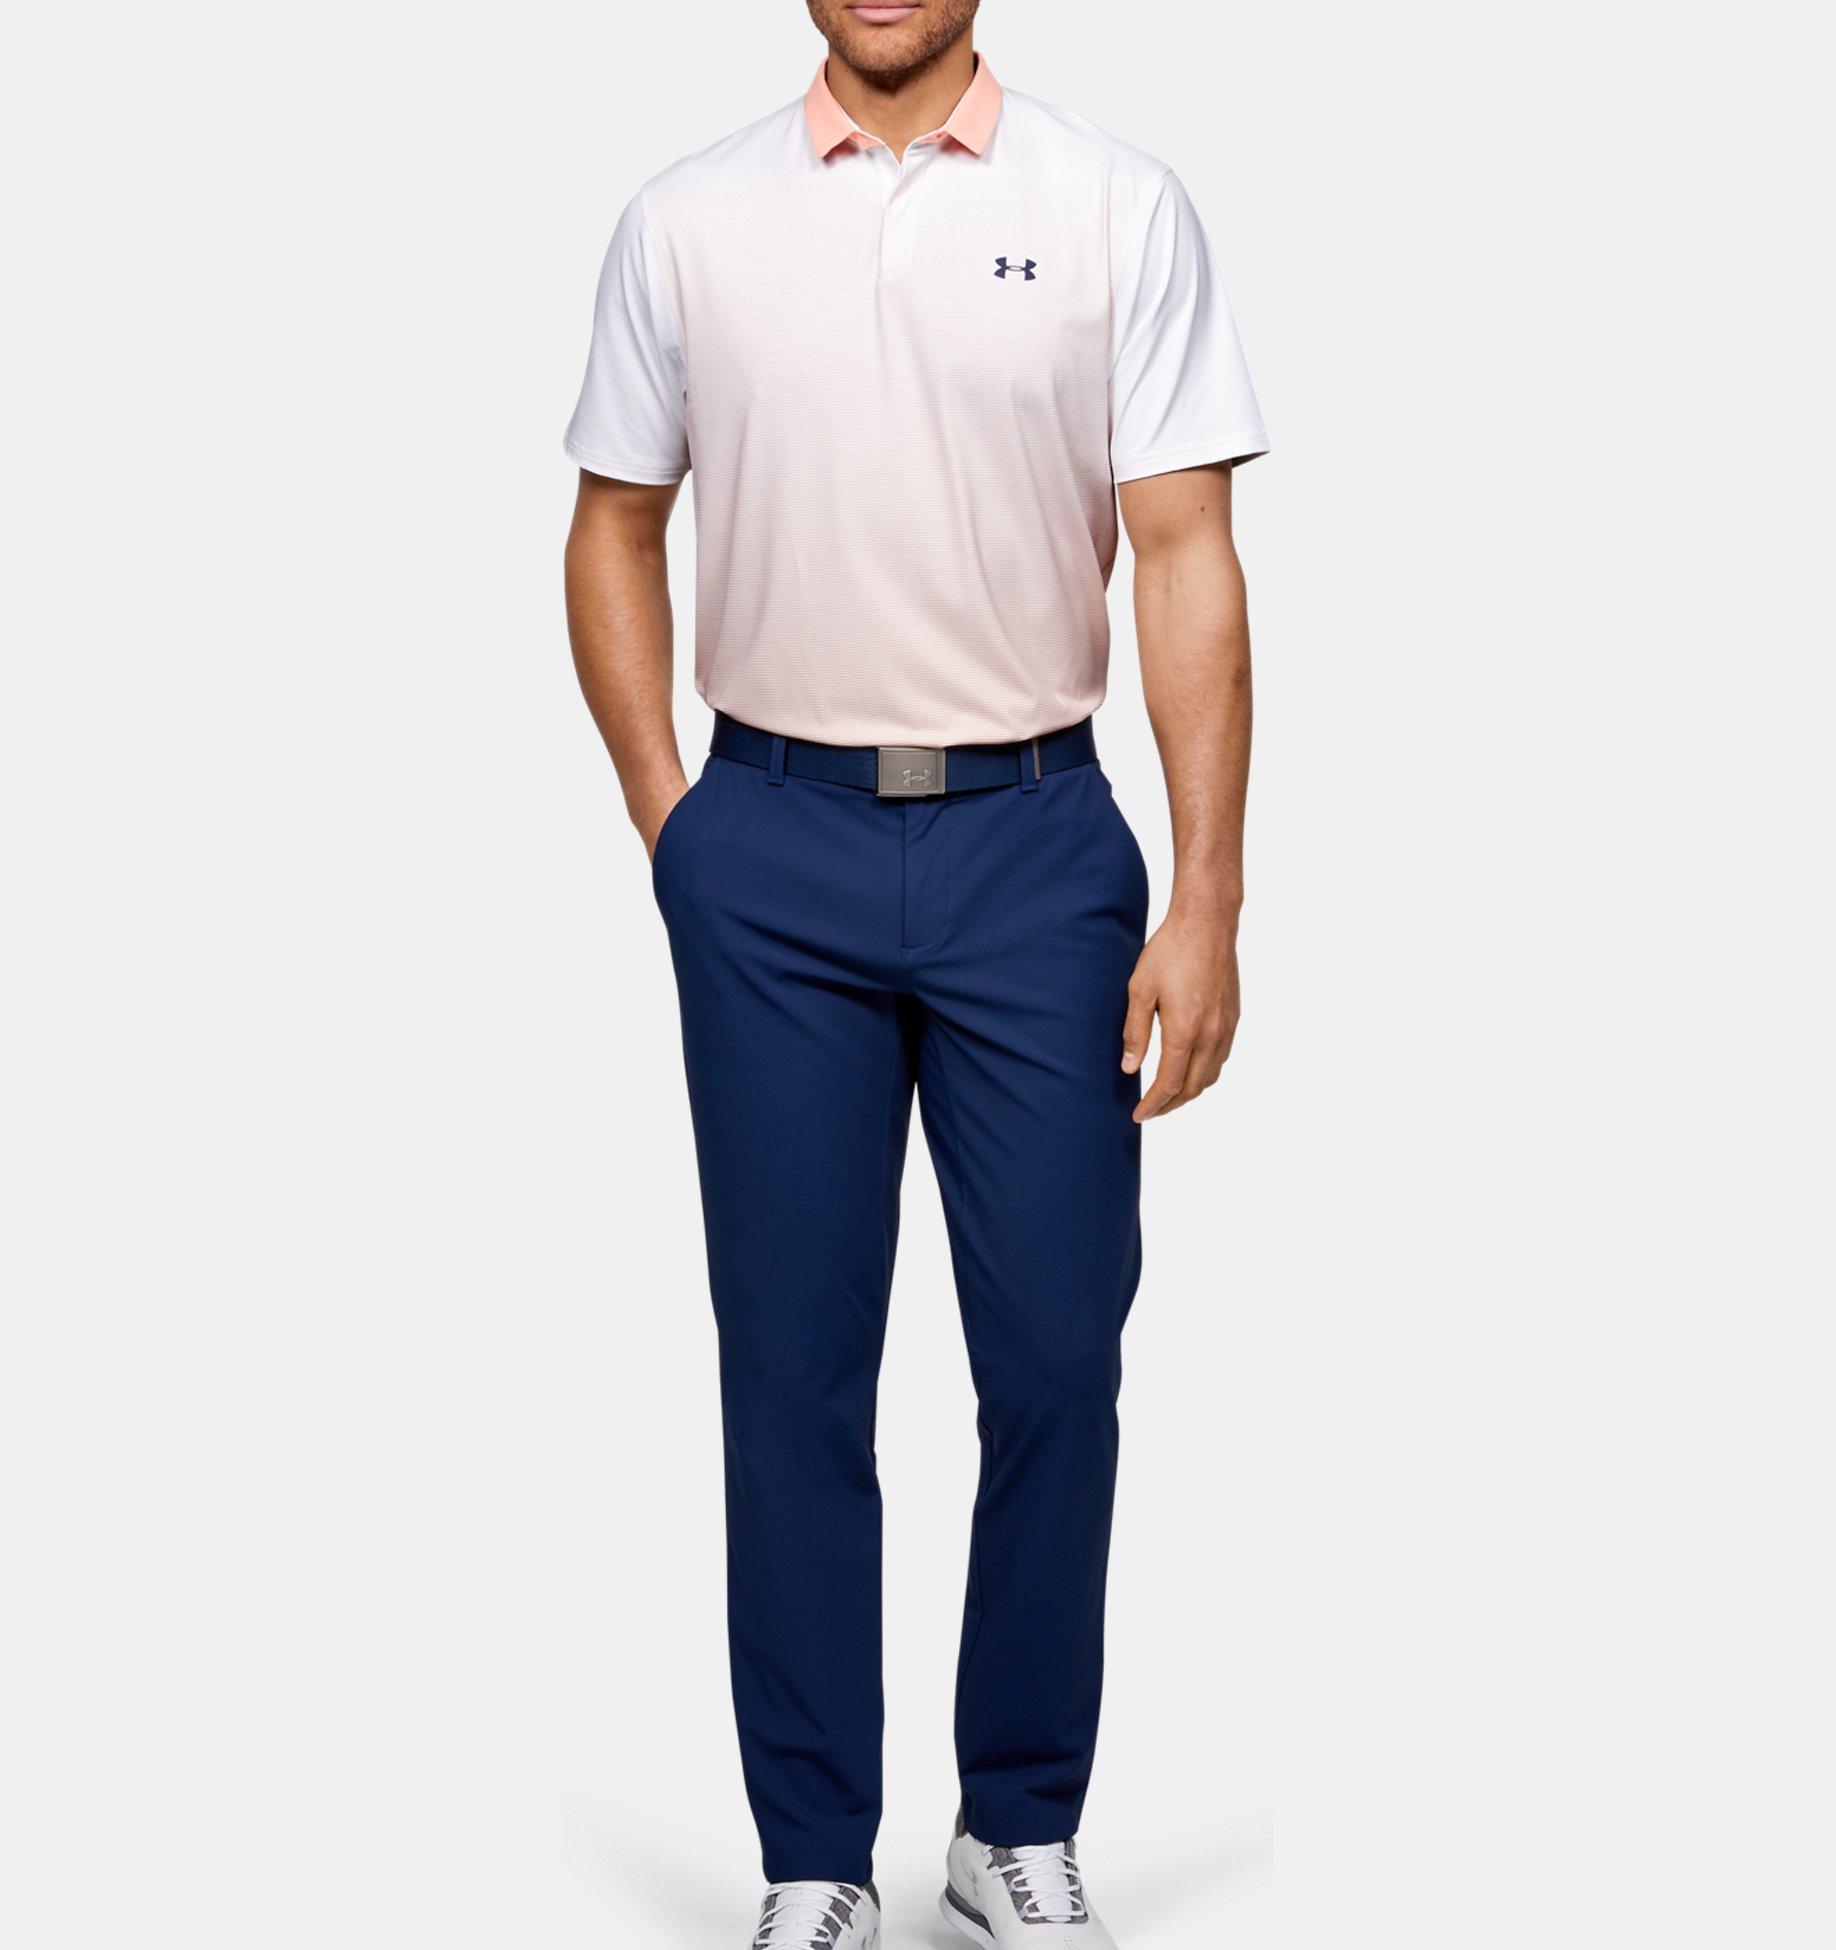 Underarmour Mens UA Iso-Chill Gradient Polo